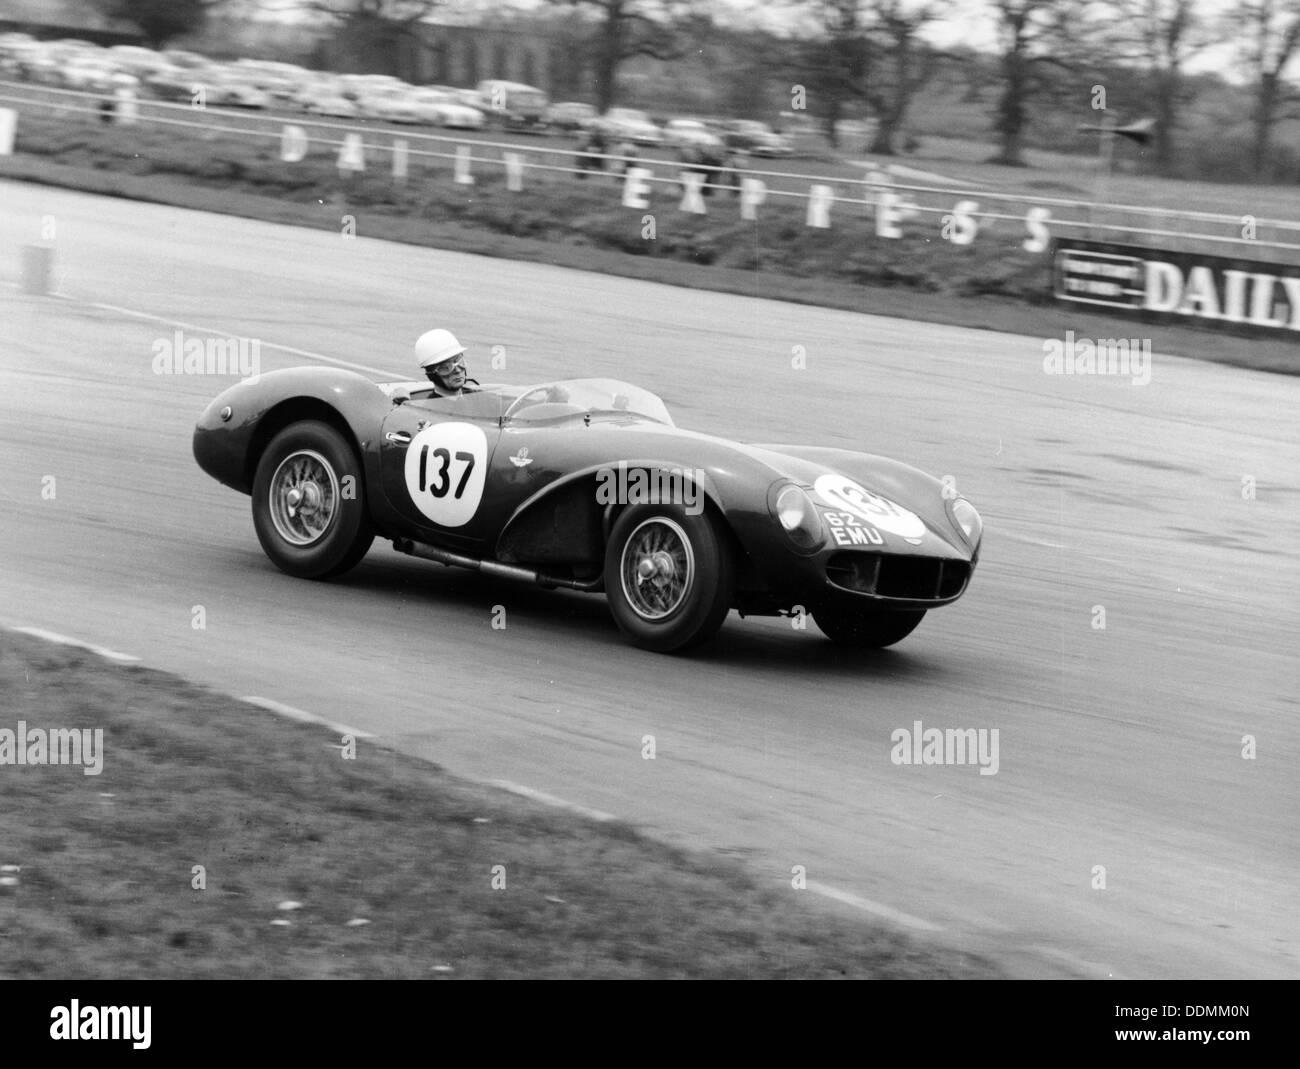 M Ward racing ein 1955 Aston Martin DB3S, Silverstone, 1962. Stockbild